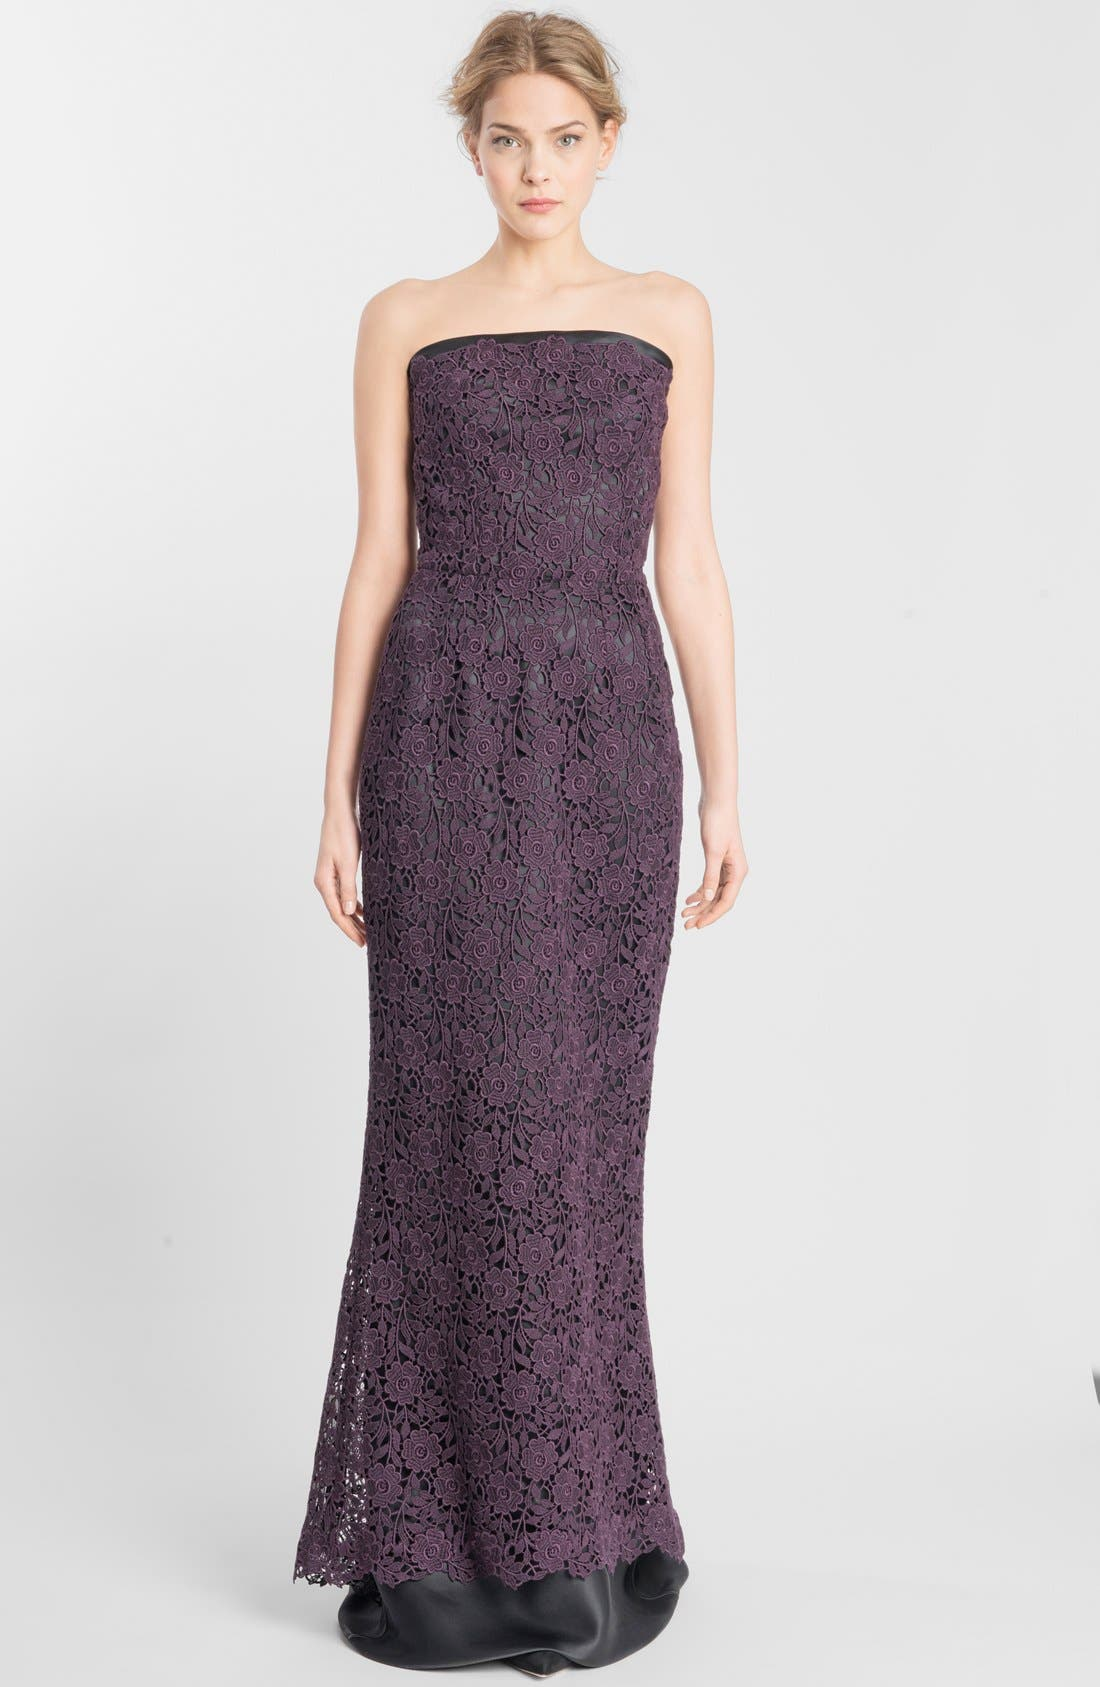 Main Image - Dolce&Gabbana Macramé Lace Gown